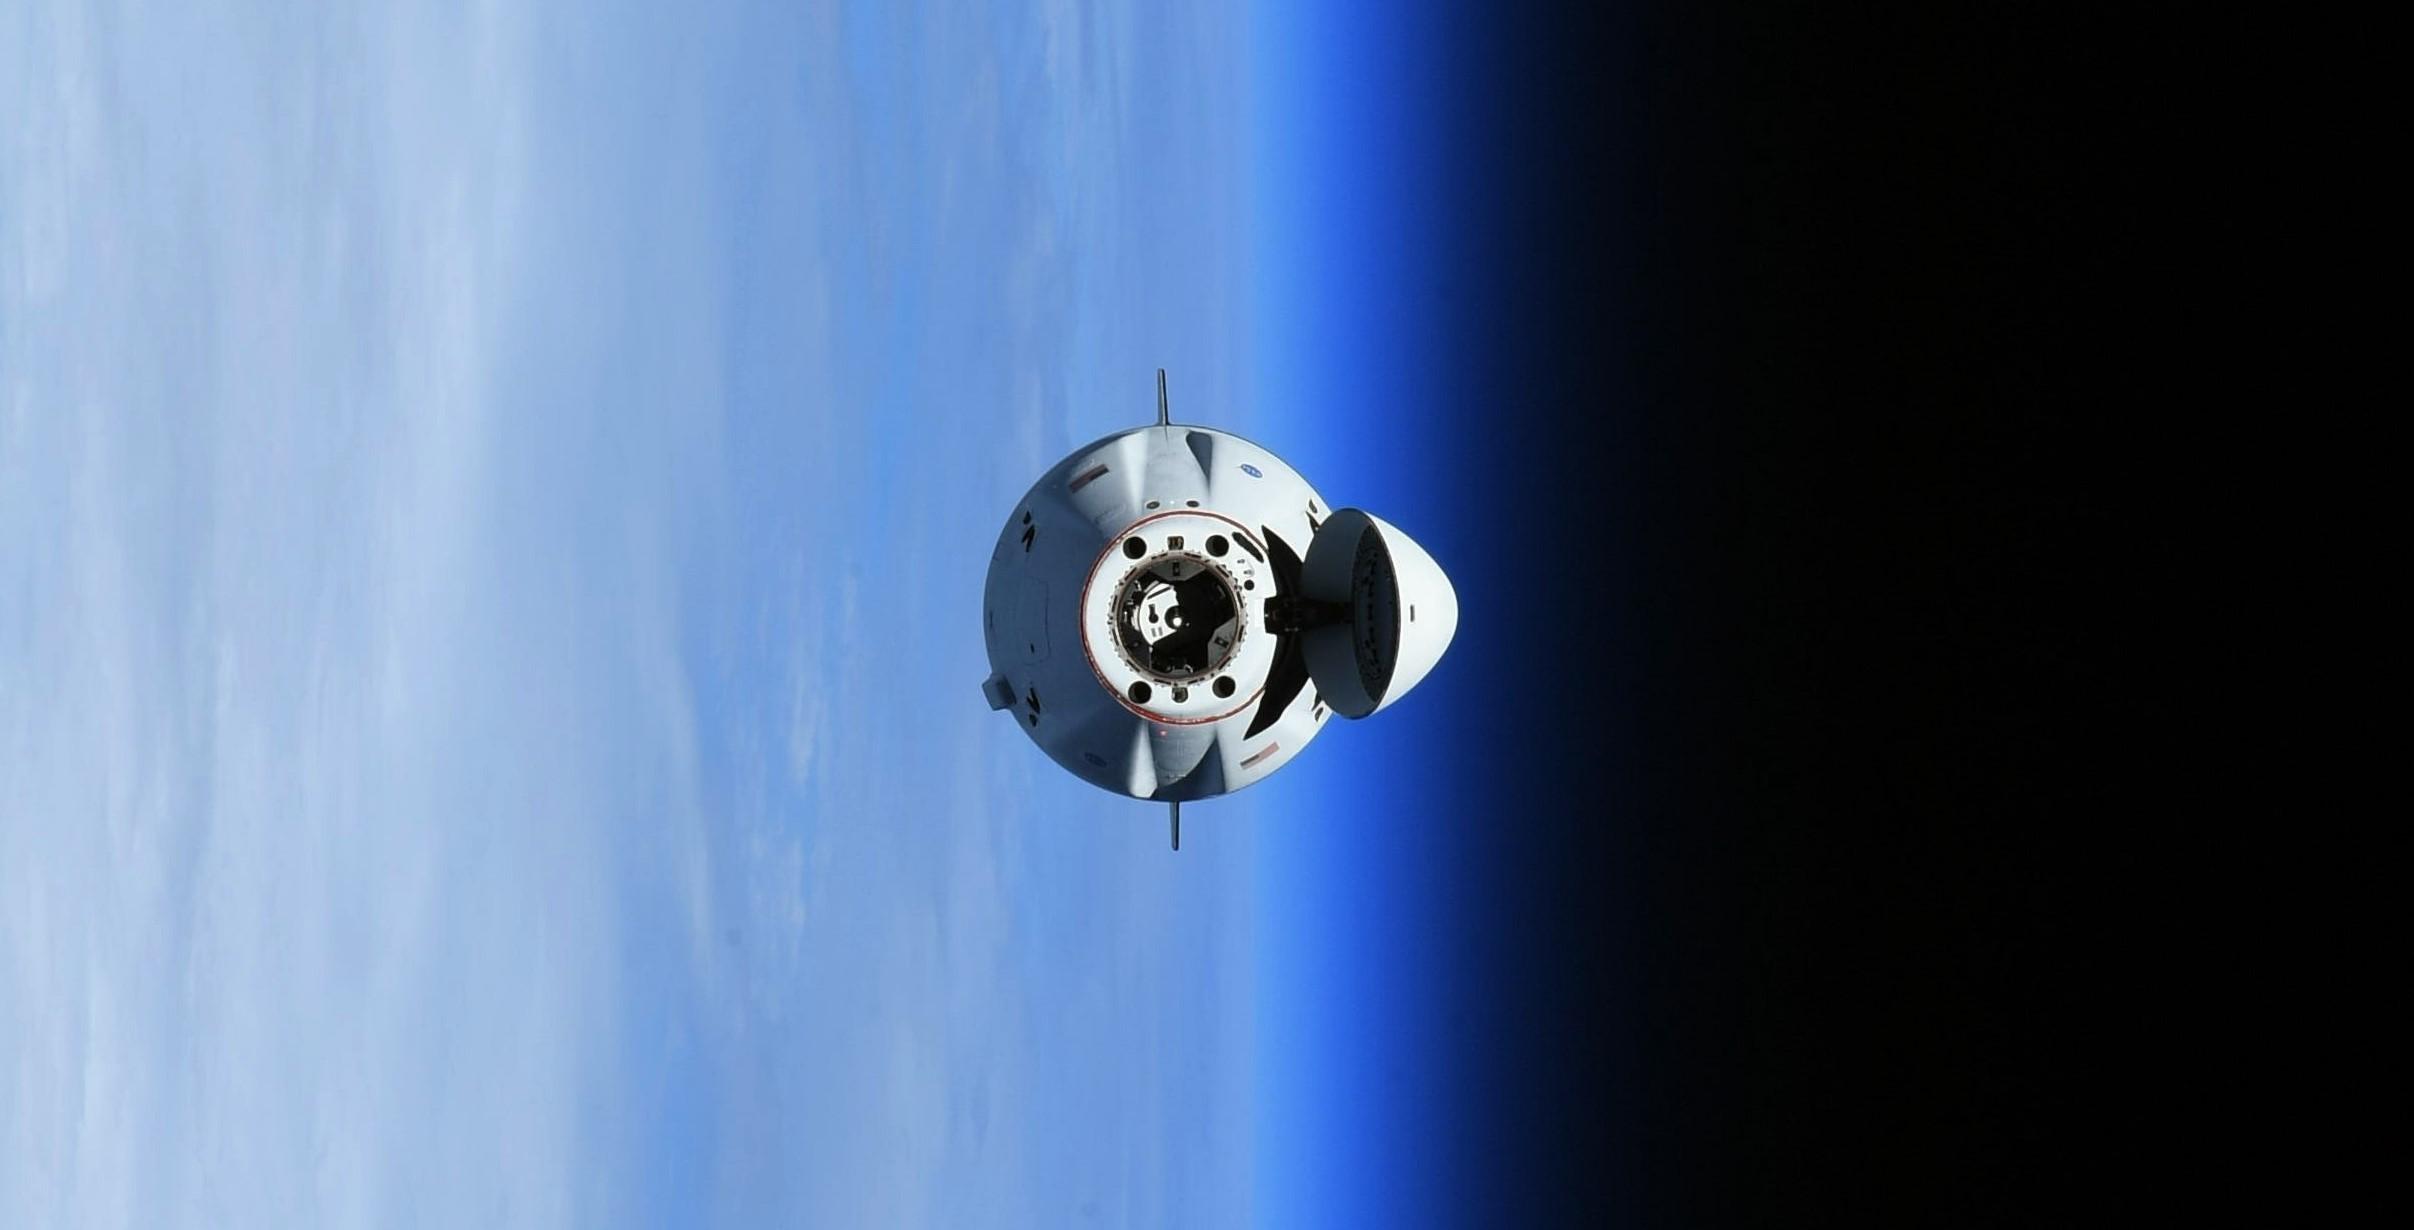 Cargo Dragon 2 C208 CRS-23 ISS arrival 083021 (Thomas Pesquet – ESA) 3 crop 1